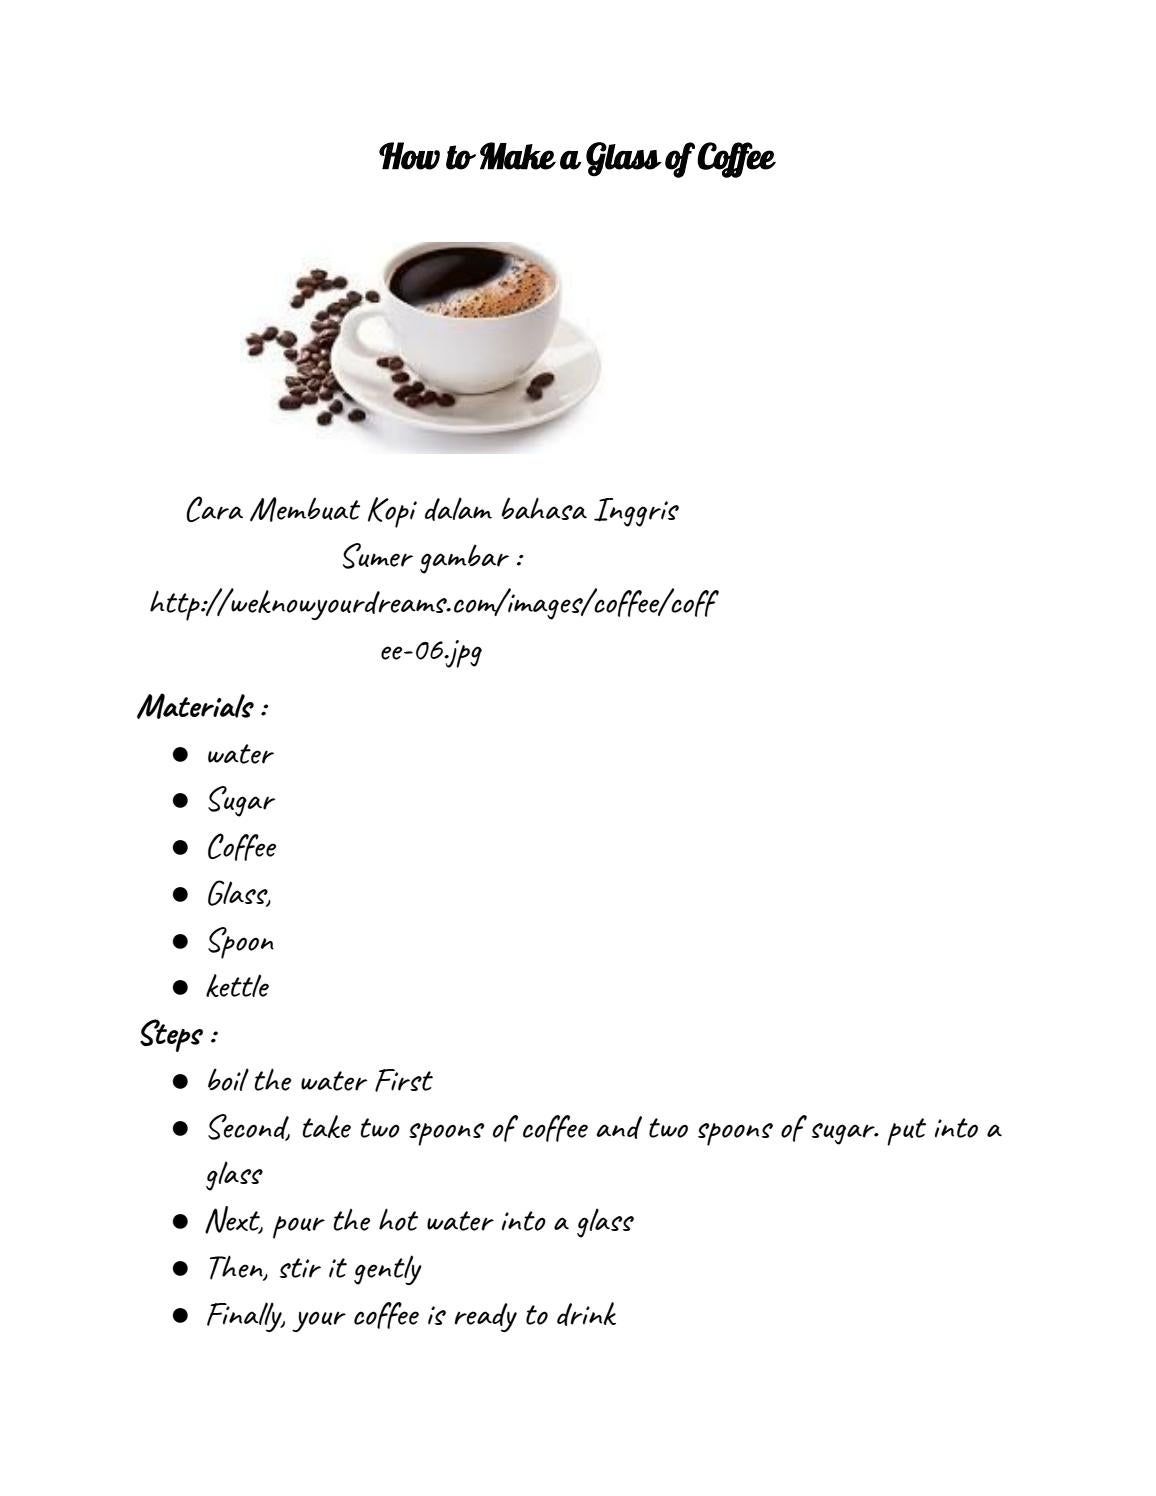 Kata Mutiara Bahasa Inggris tentang Kopi (Coffee) Beserta